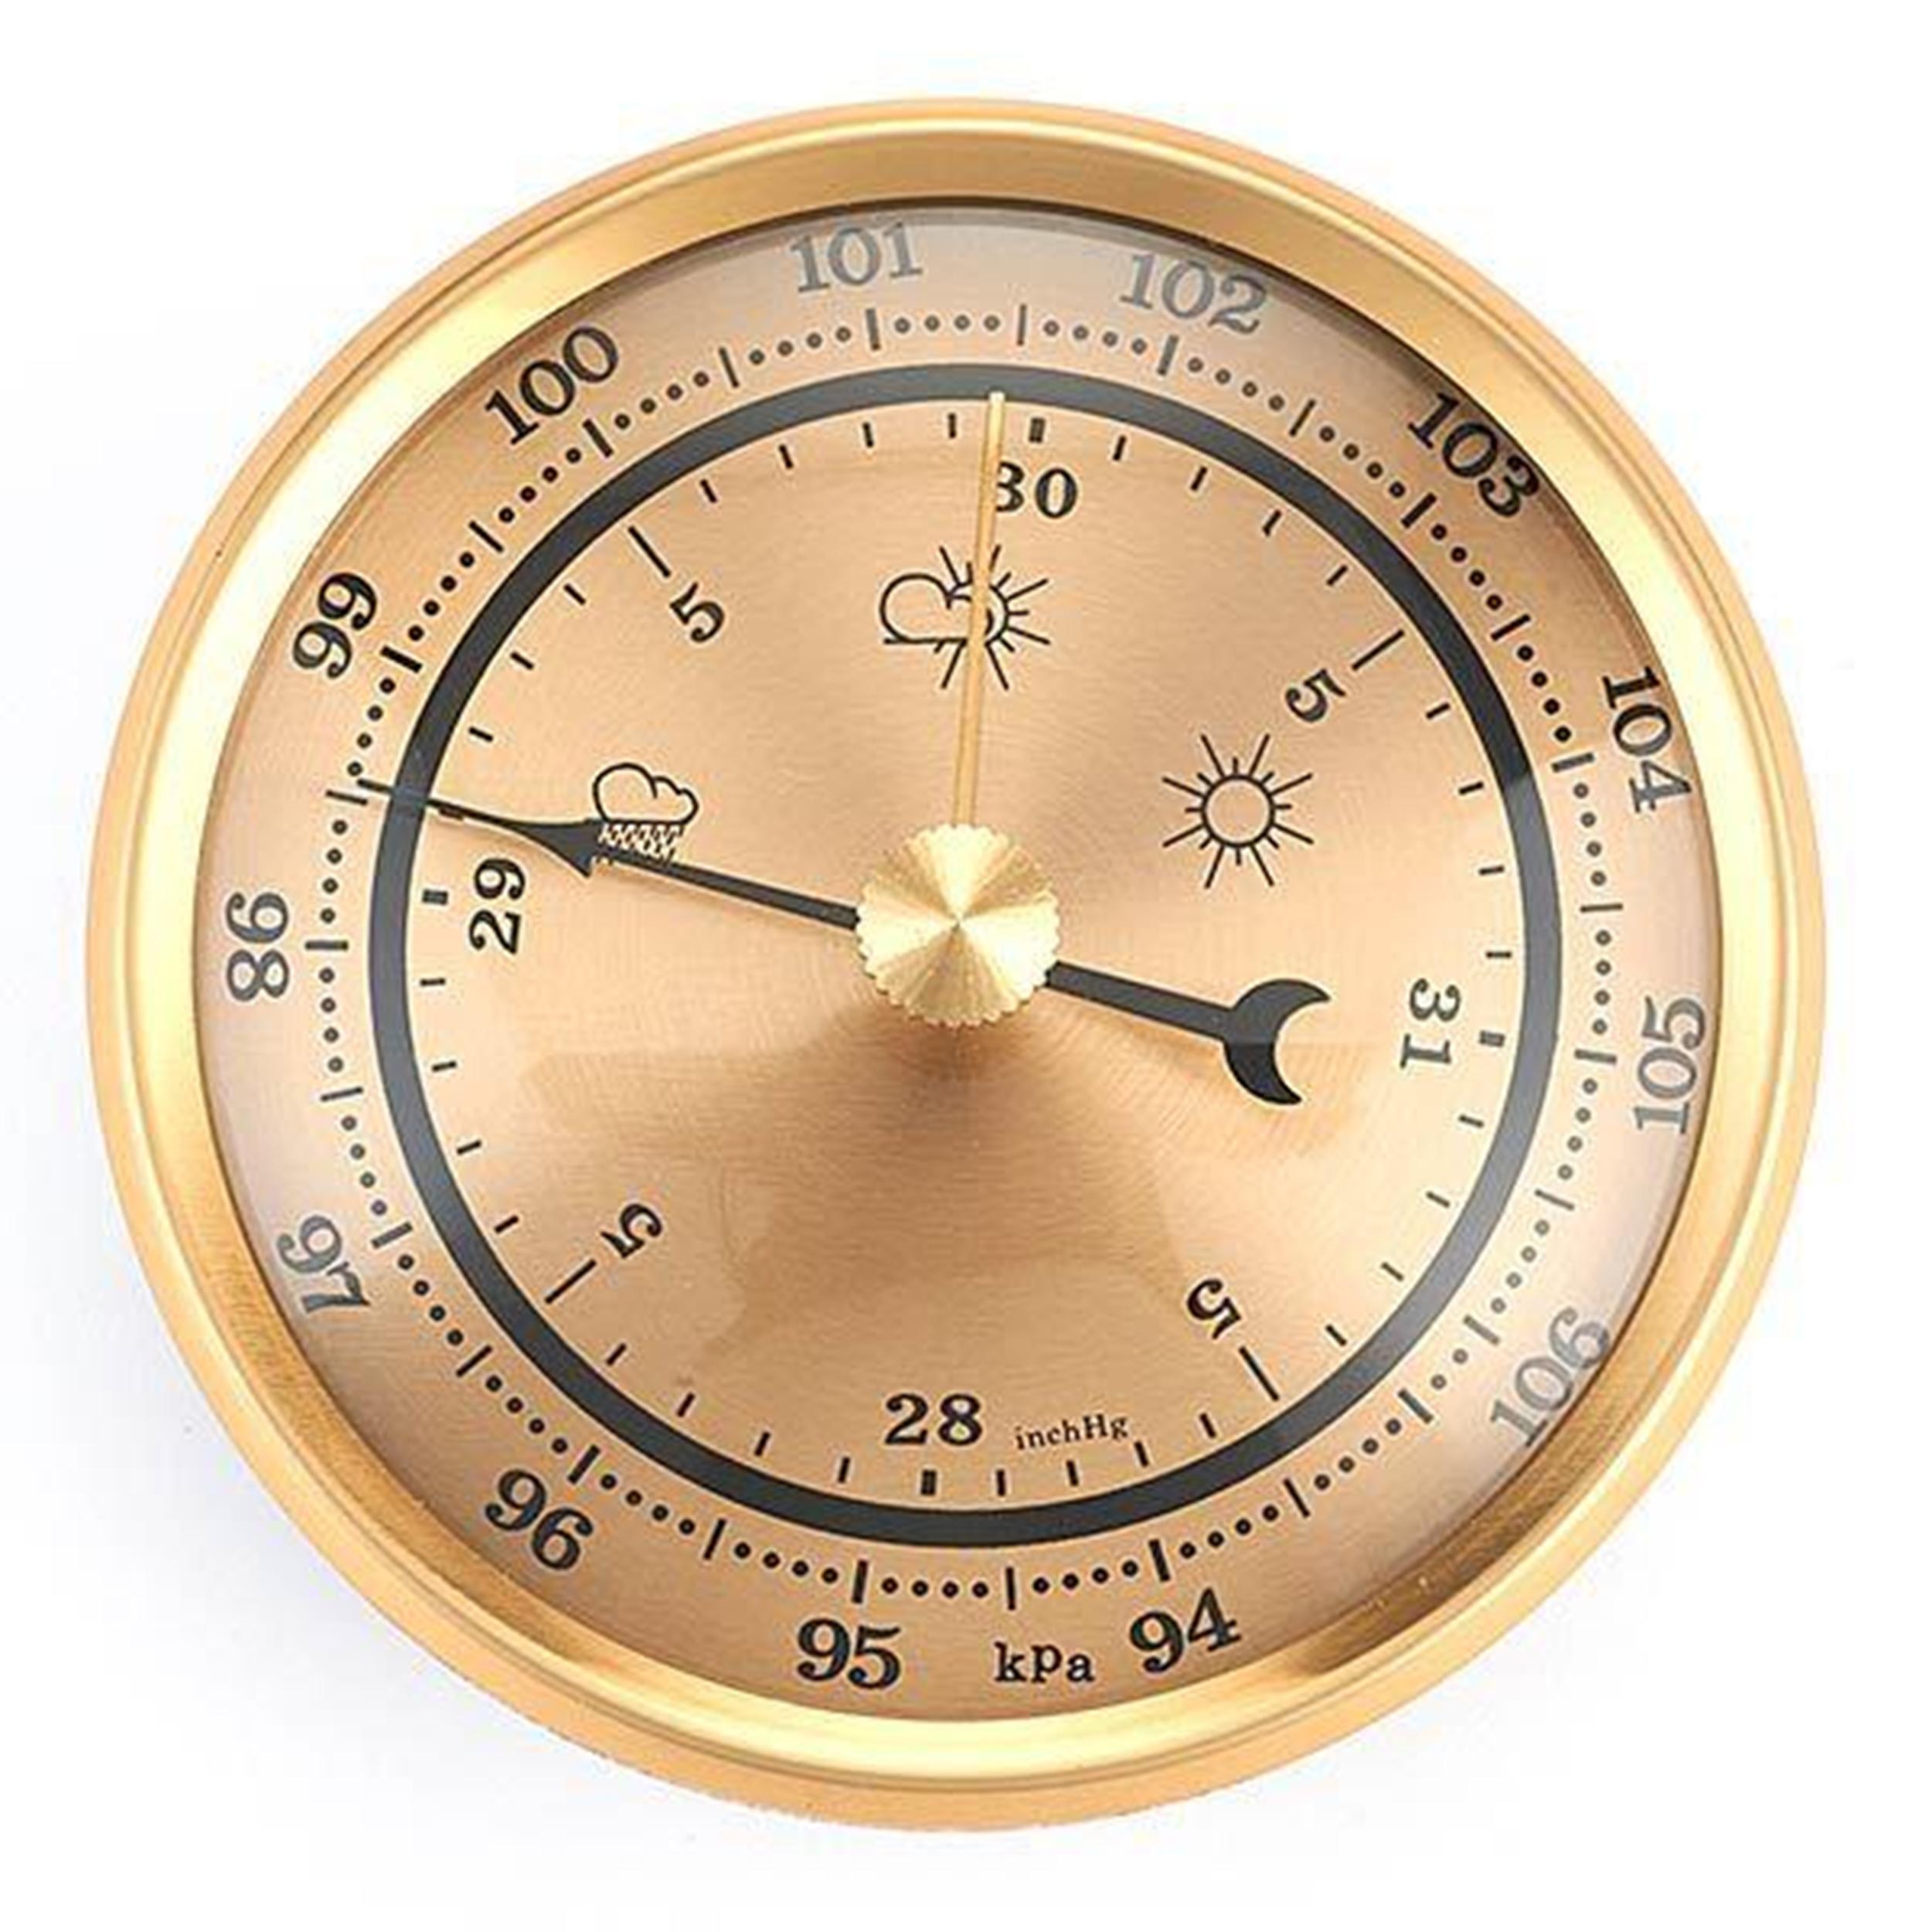 Barometer w/Brushed Gold Dial and Brushed Gold Bezel